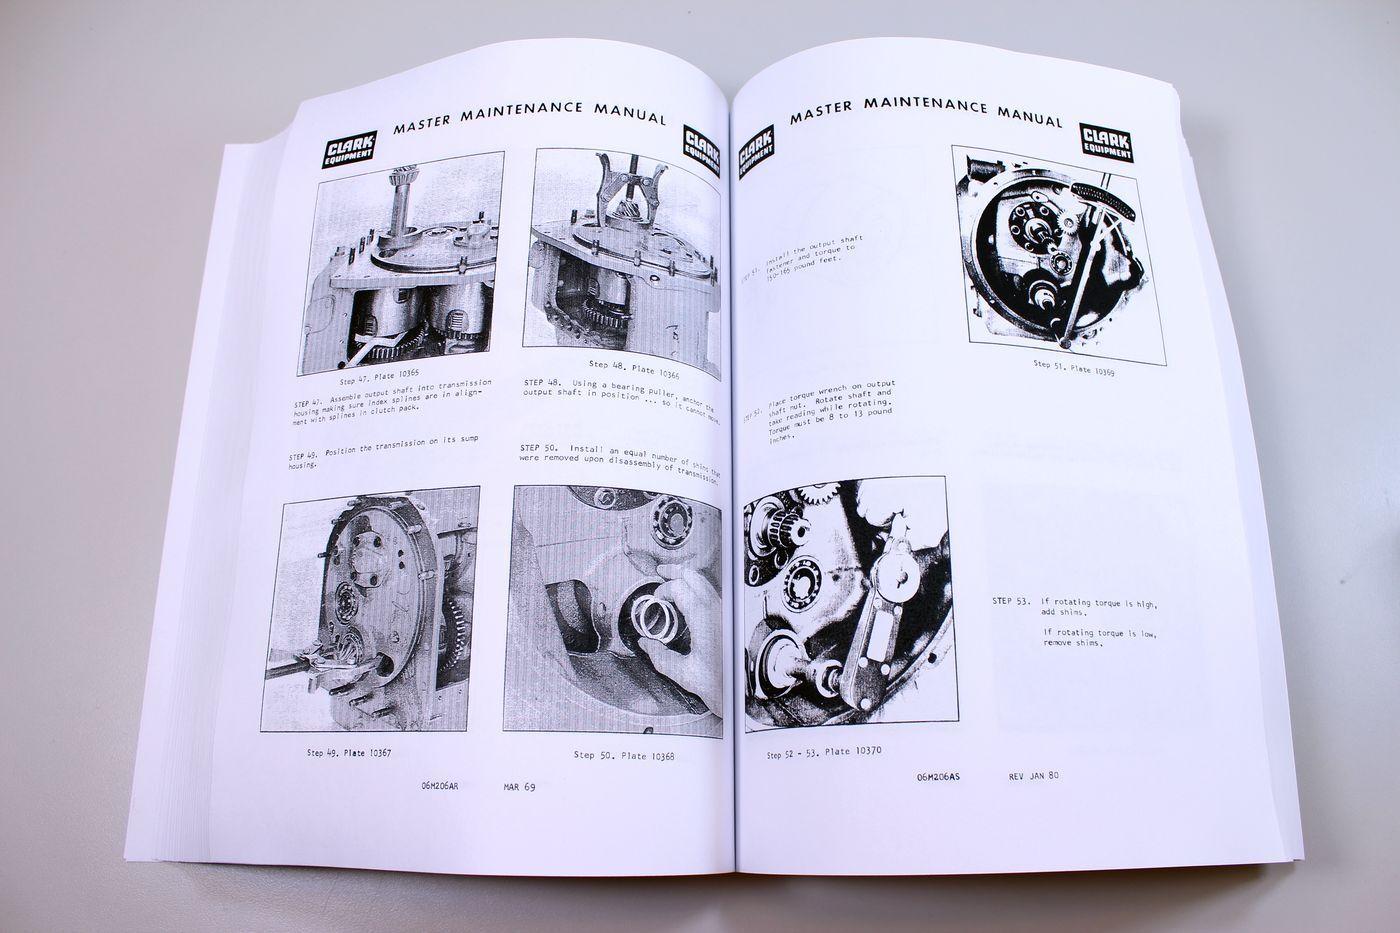 Clark C500 35 Manual Gcx25 Wiring Diagram 1993 Service Array H40 H45 Forklift Repair Shop C500h40 Rh Ebay Com